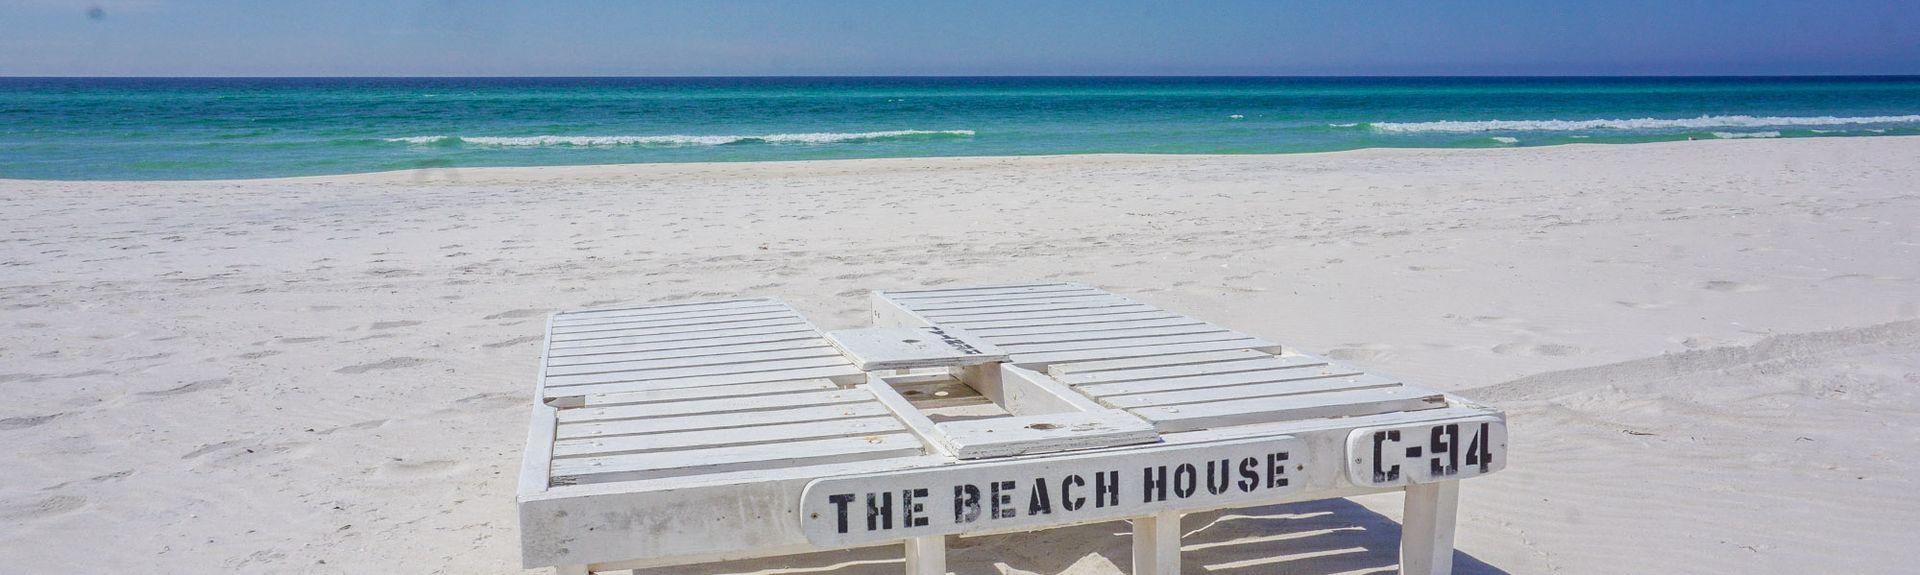 Carillon Beach Ph I (Florida, Yhdysvallat)